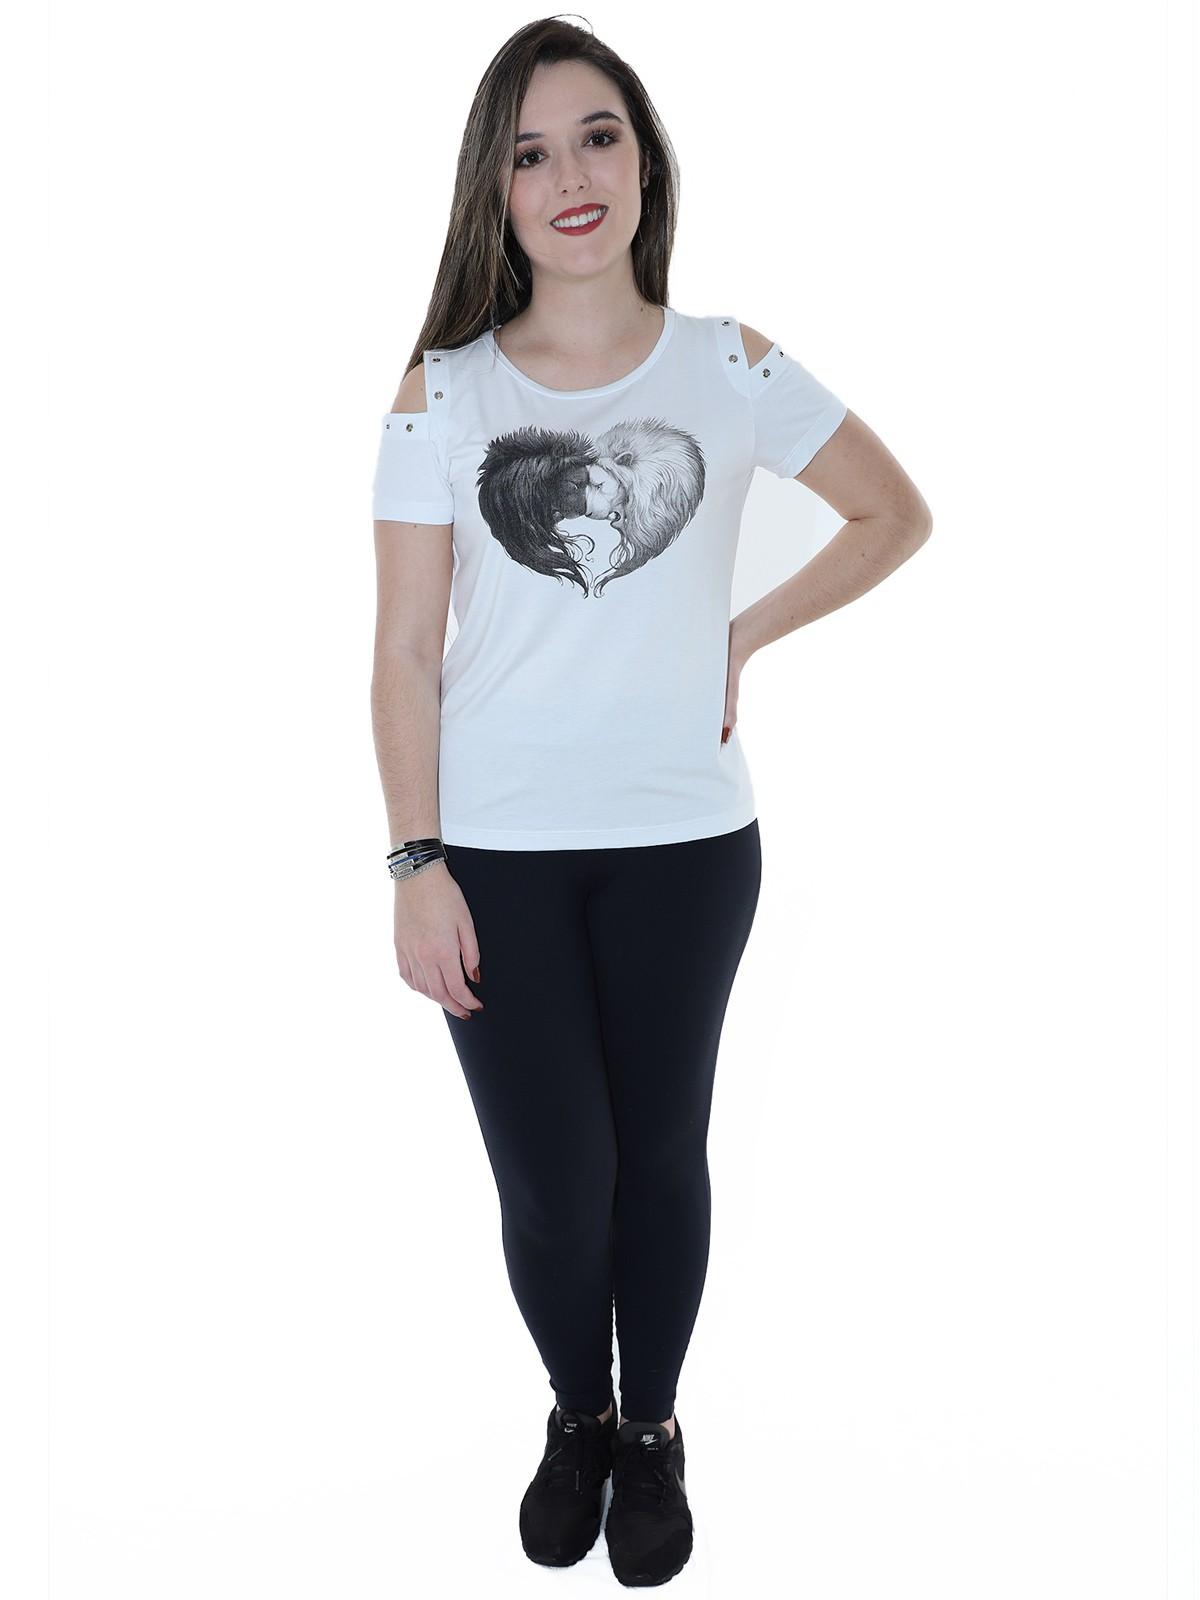 Blusa Feminina Longuete Ombro com Ilhois Anistia Branca